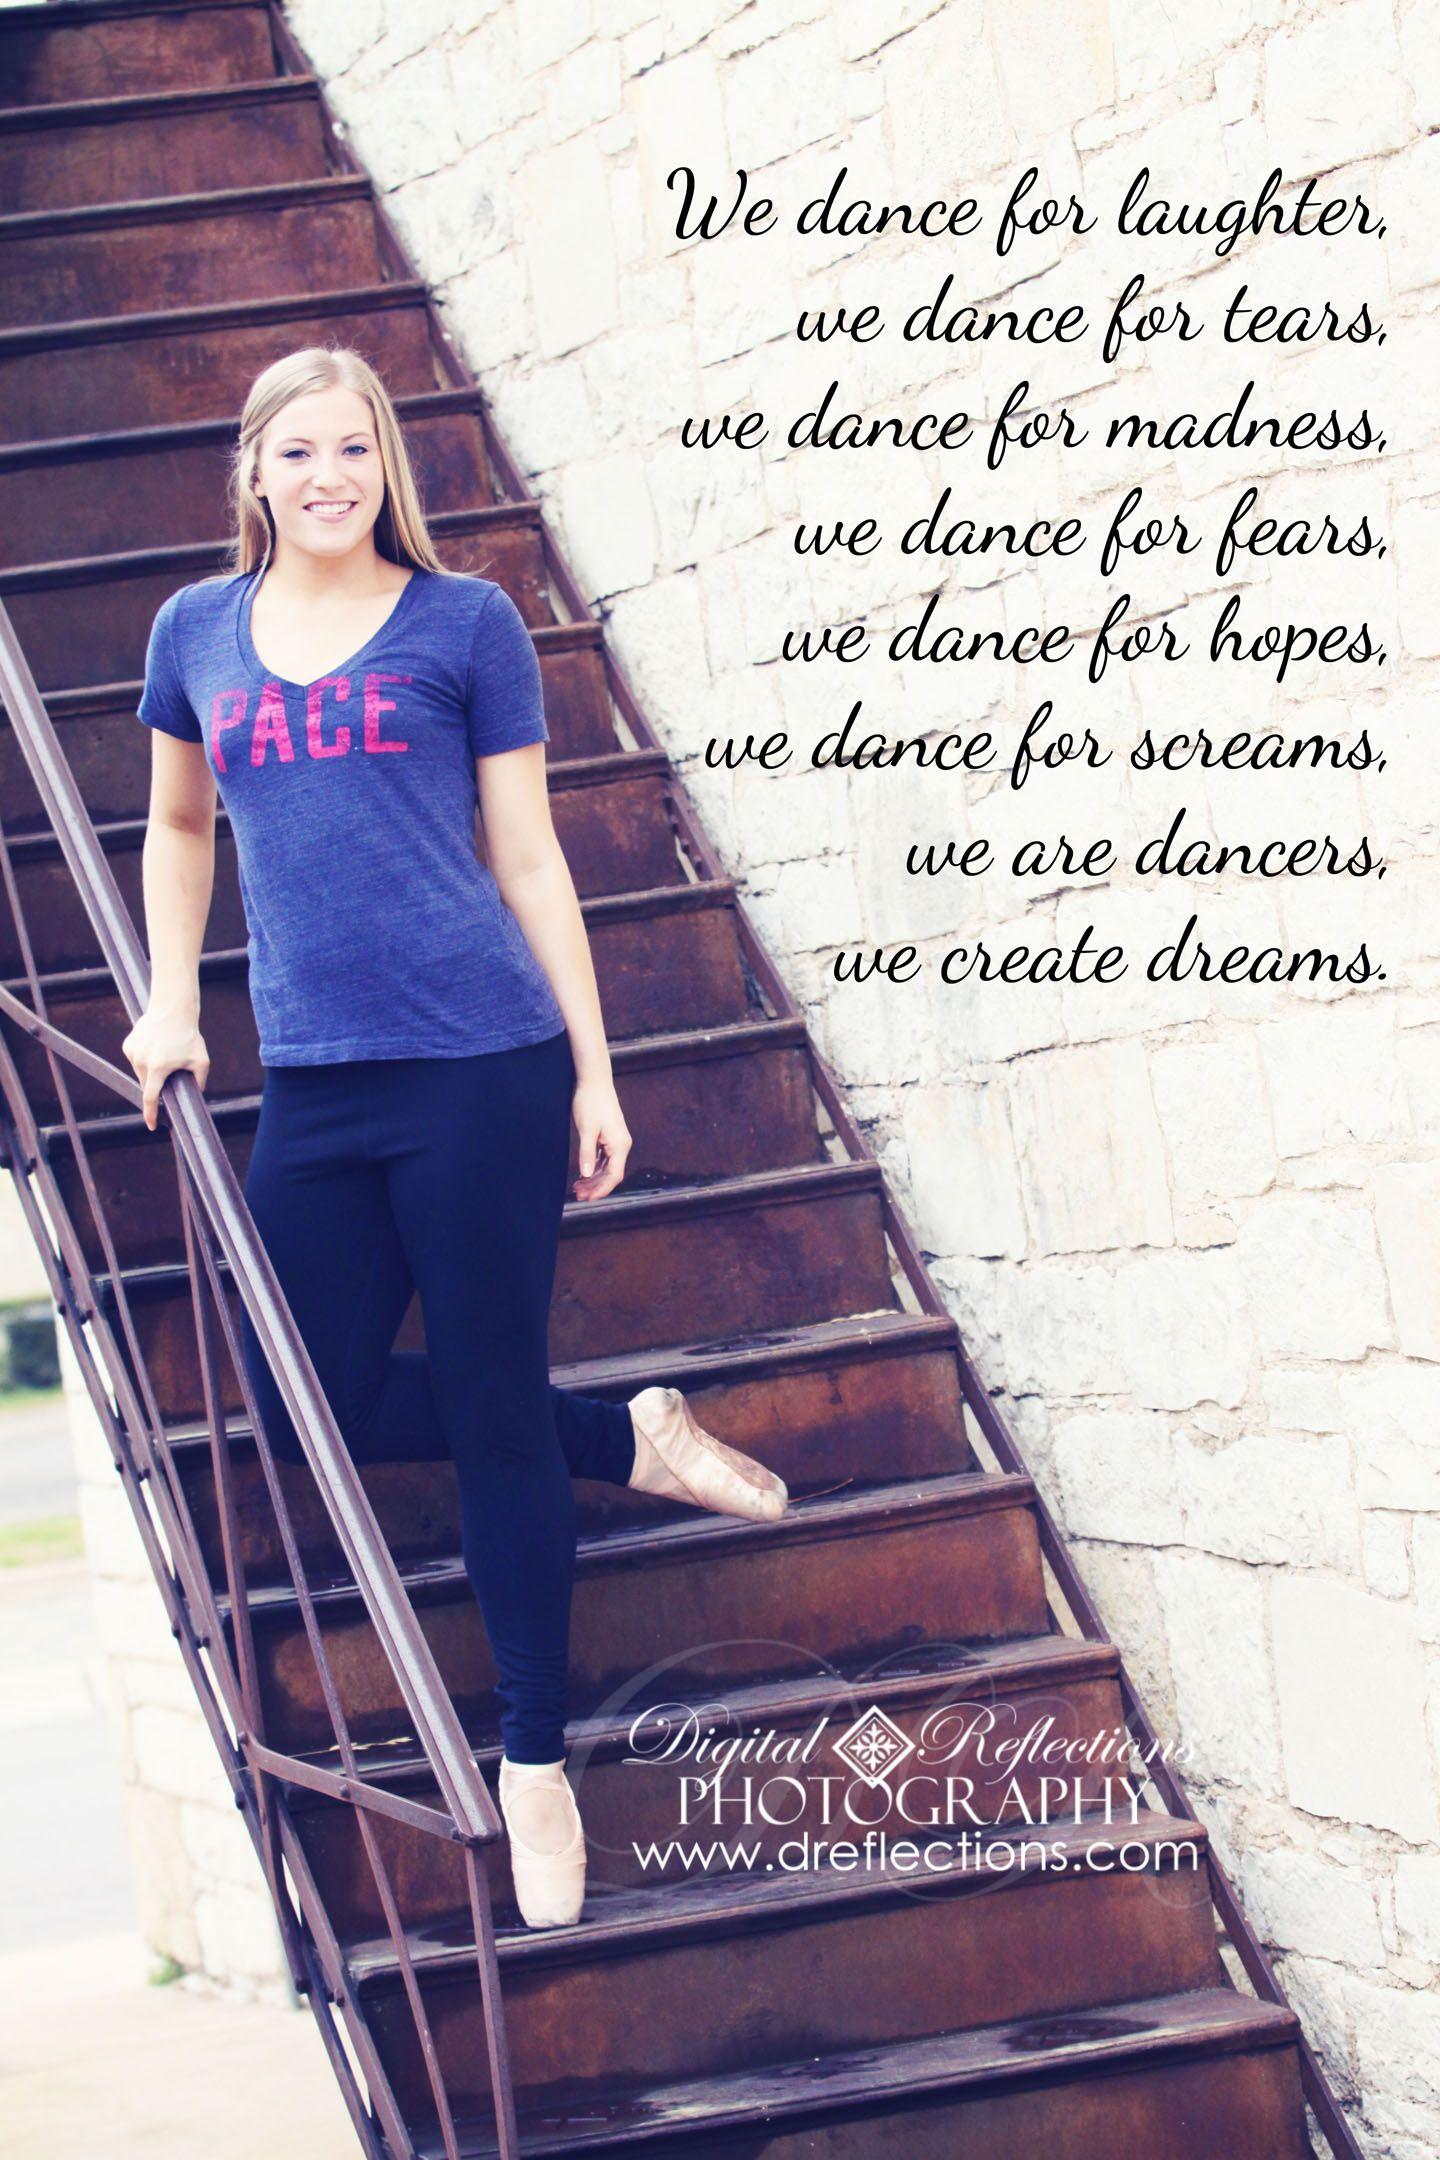 Senior Photo, Dance Quote, Pace University, Heading to NYC